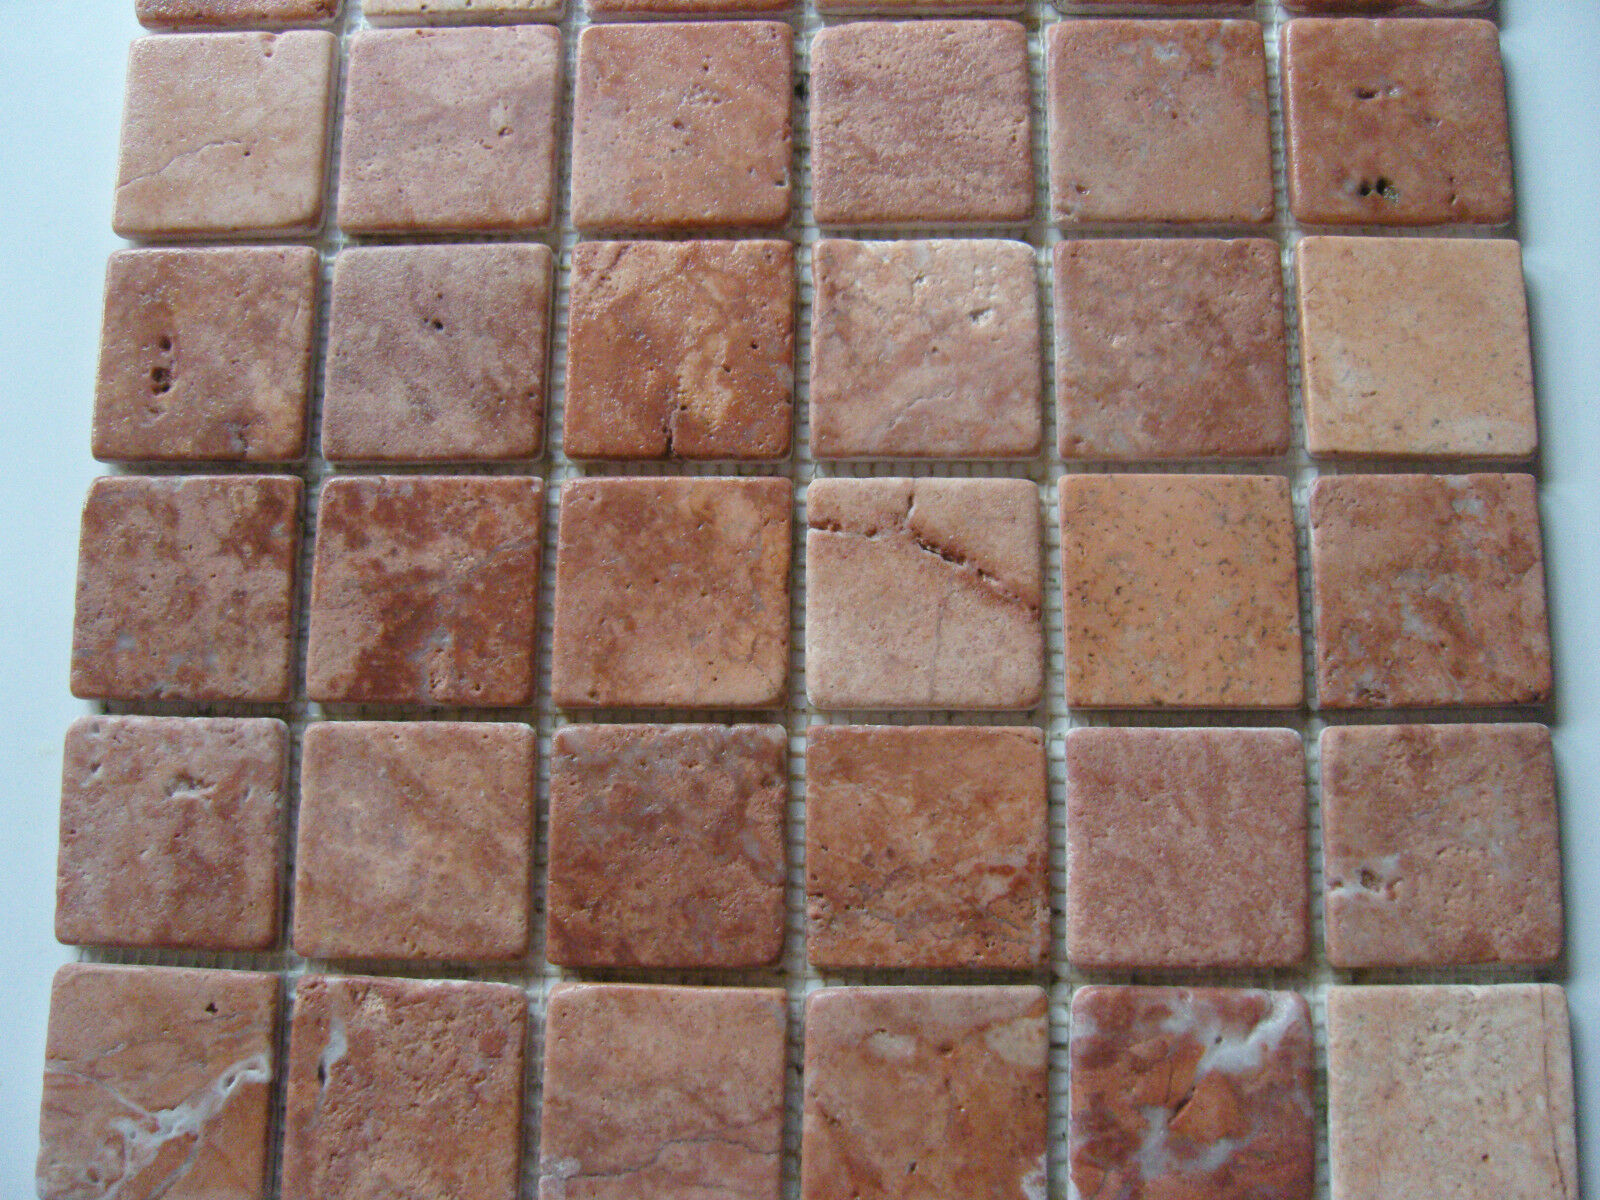 1 qm - Bad Fliese Naturstein Marmor Mosaik rot Rot st0401  antik style